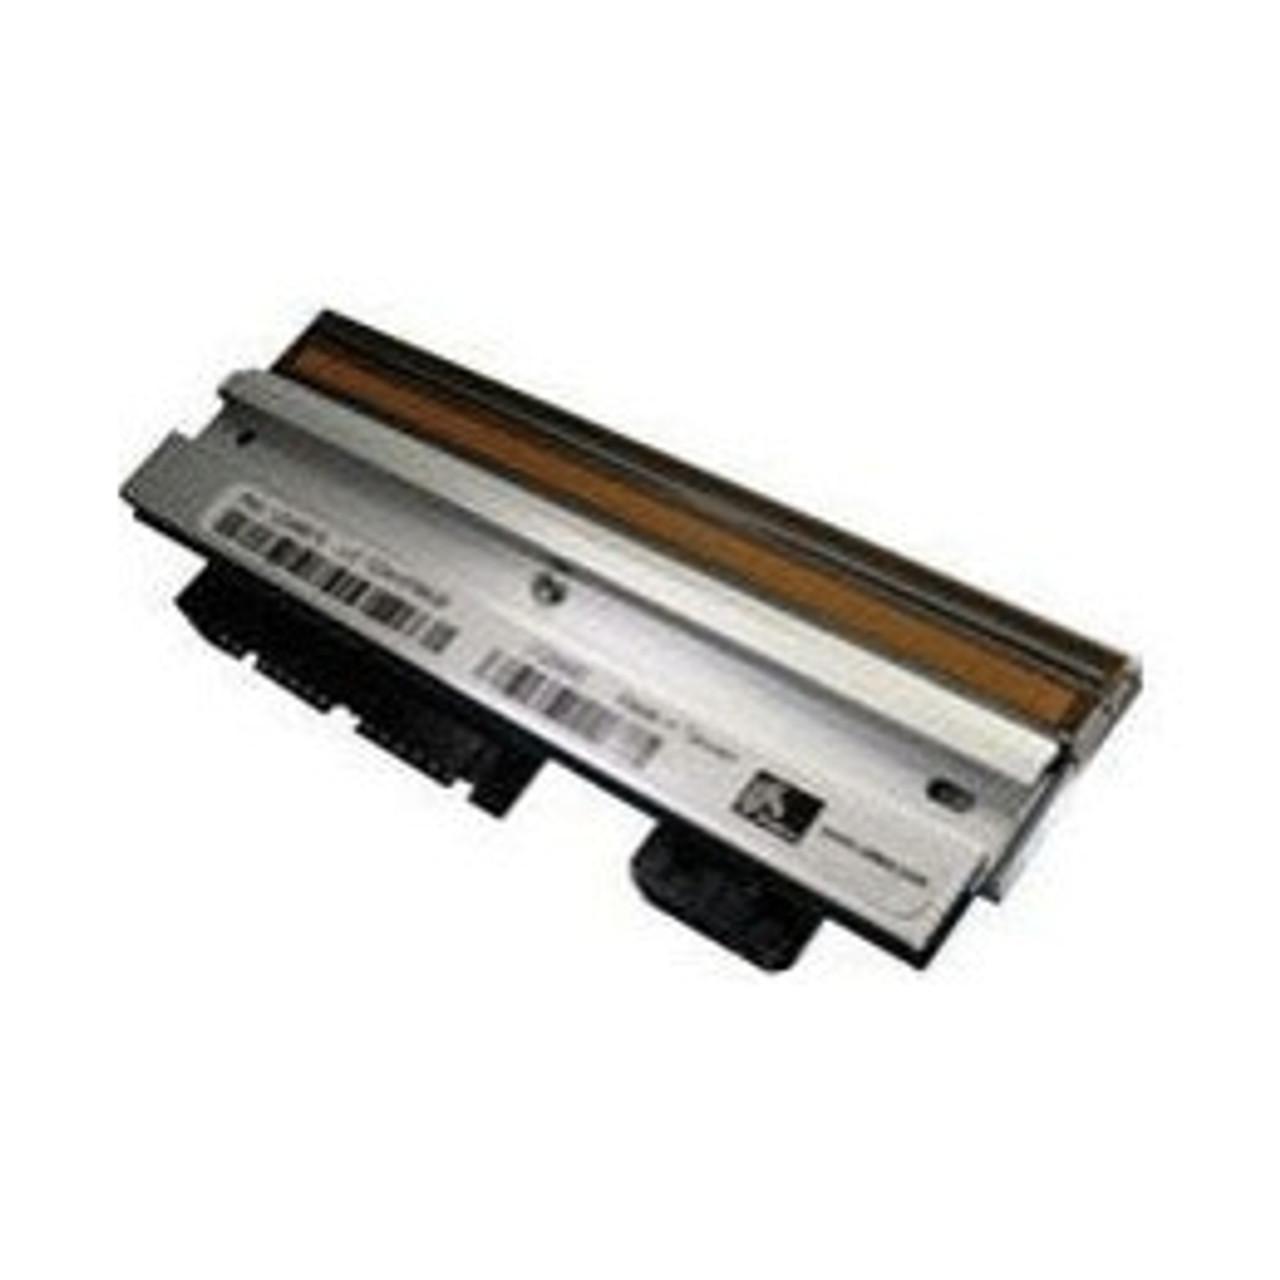 P330m Printheads & Parts